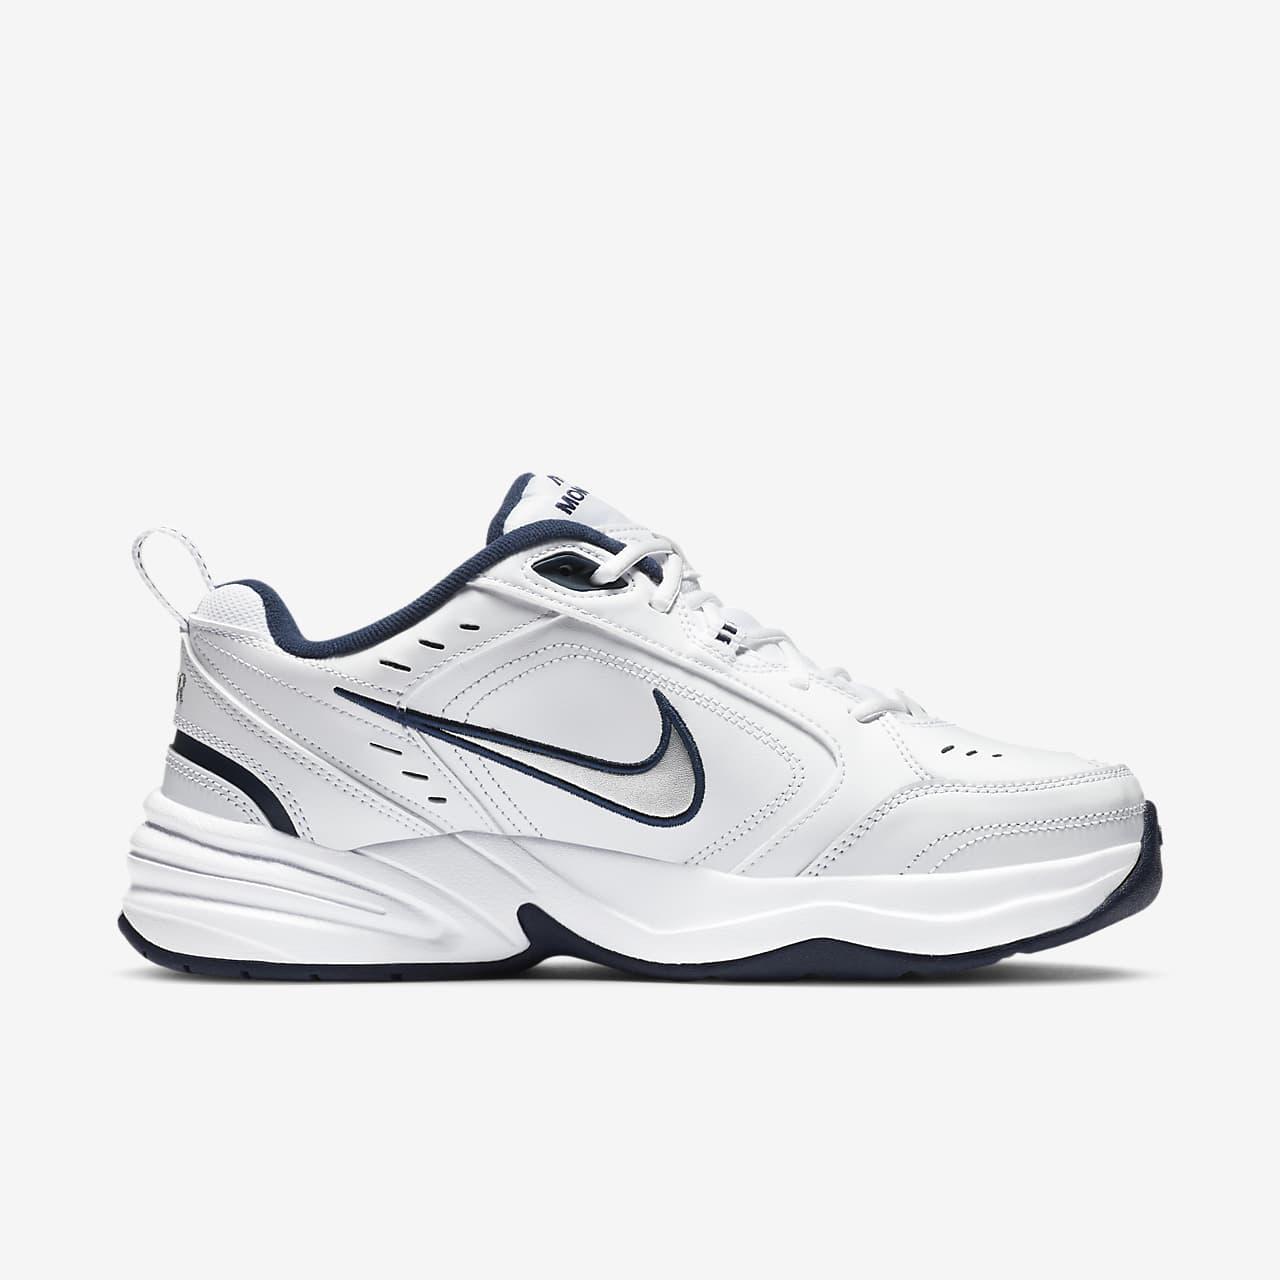 Nike Air Monarch Iv, Chaussures de Gymnastique Homme, Blanc (White/Black 101), 40.5 EU